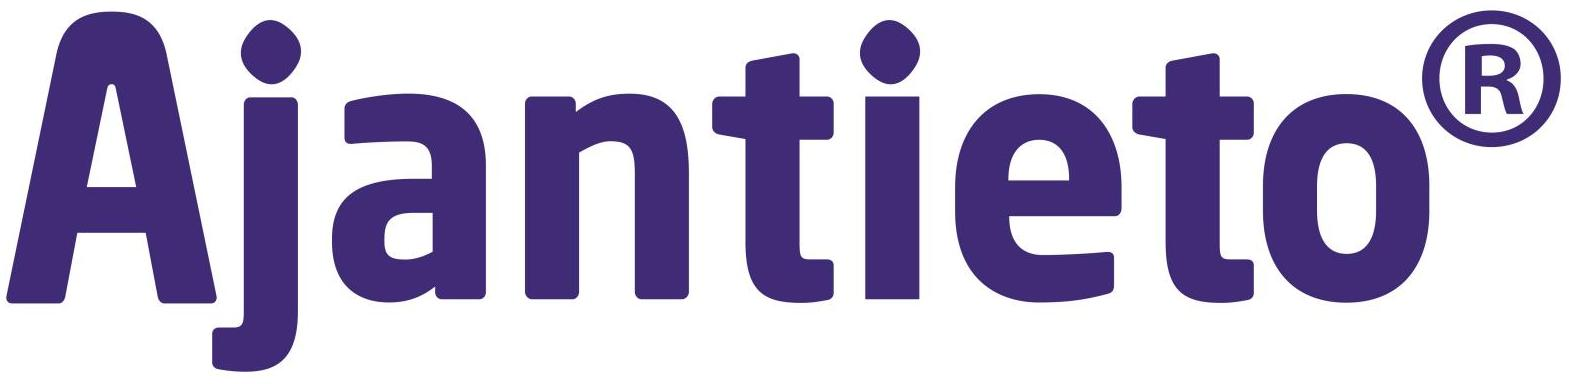 Ajantiedon logo